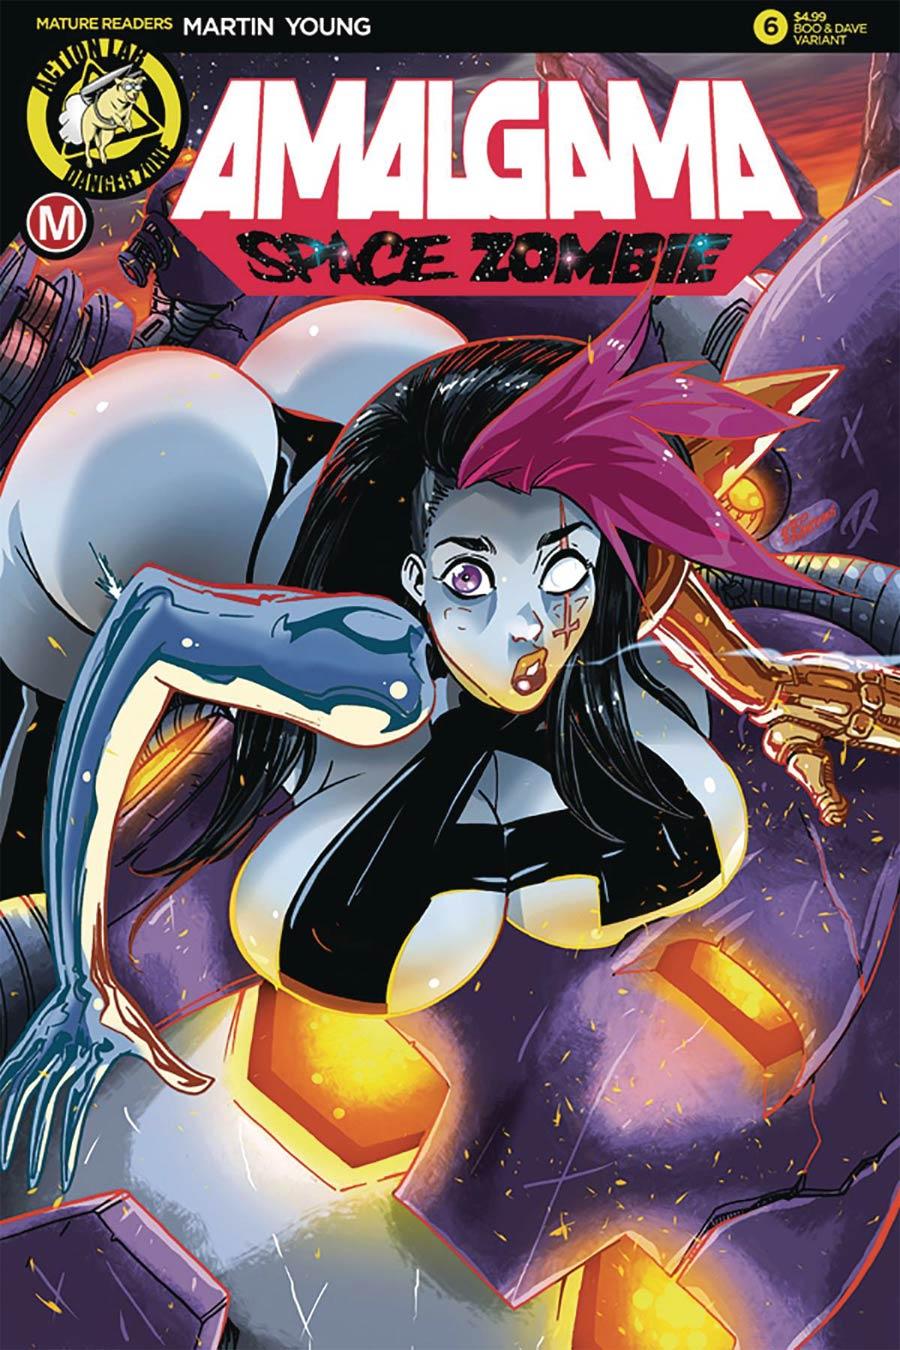 Amalgama Space Zombie #6 Cover C Variant Rudetoons Cover